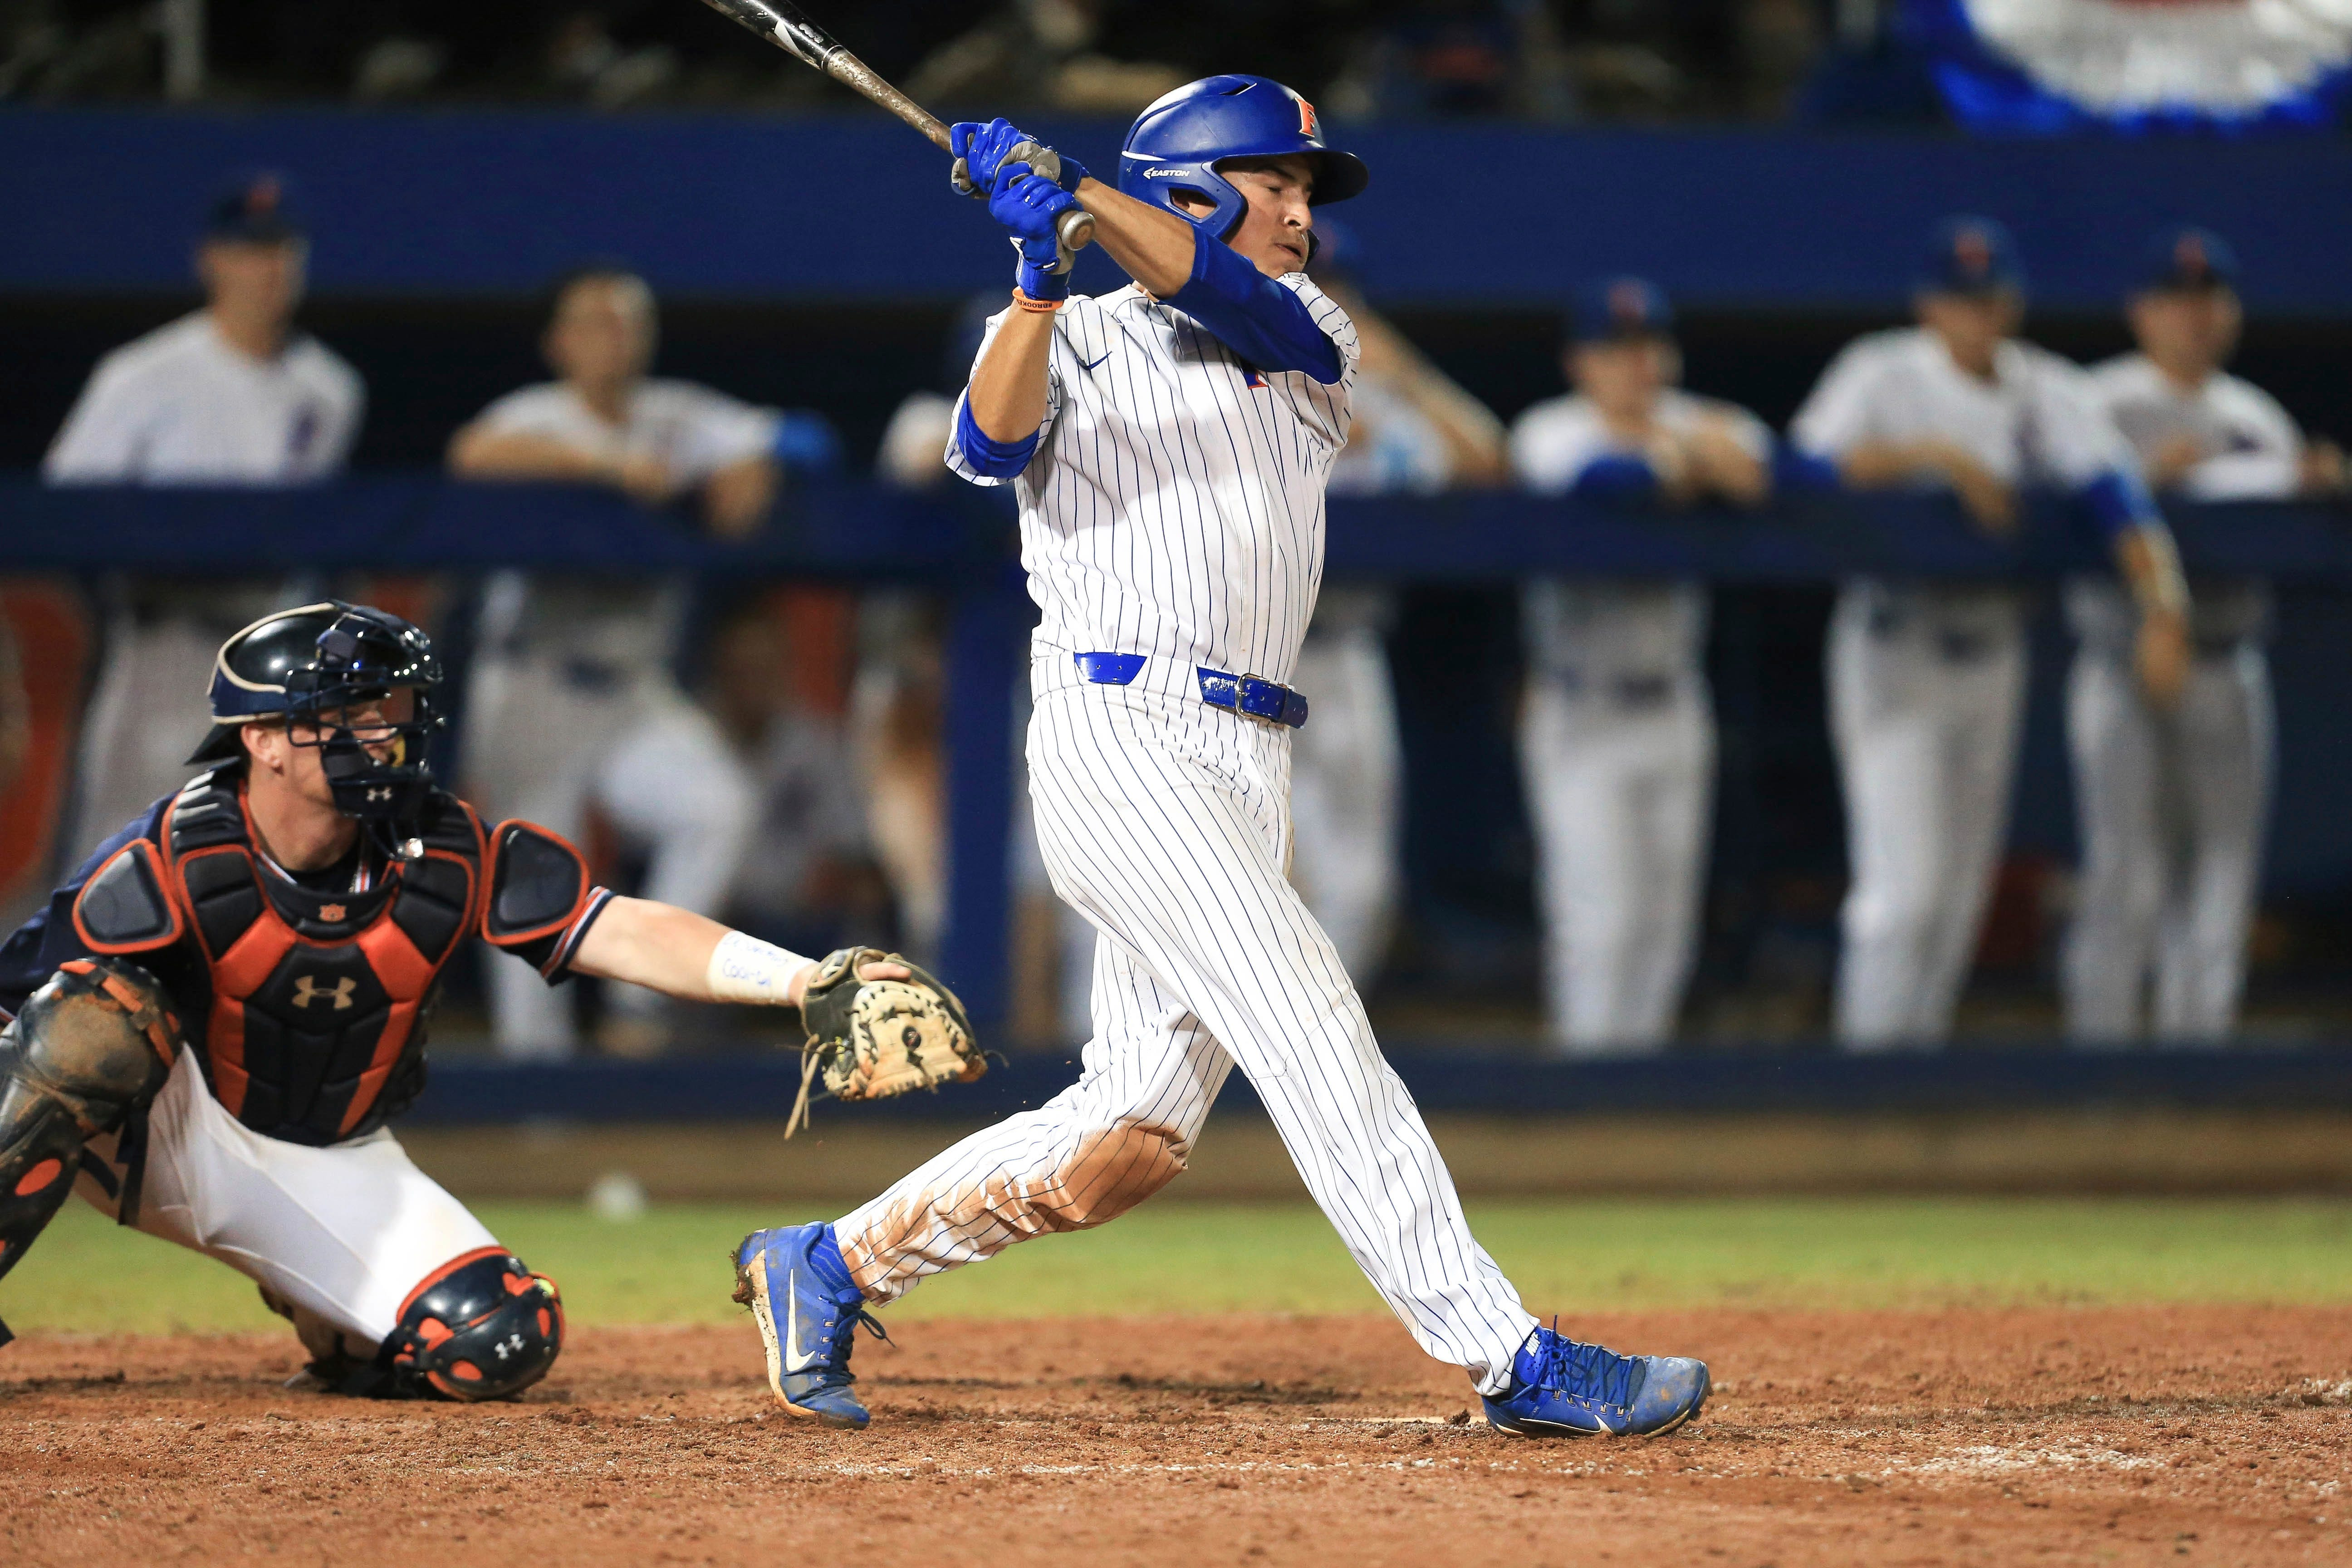 Florida returns to College World Series with walk-off home run off Auburn outfielder's glove